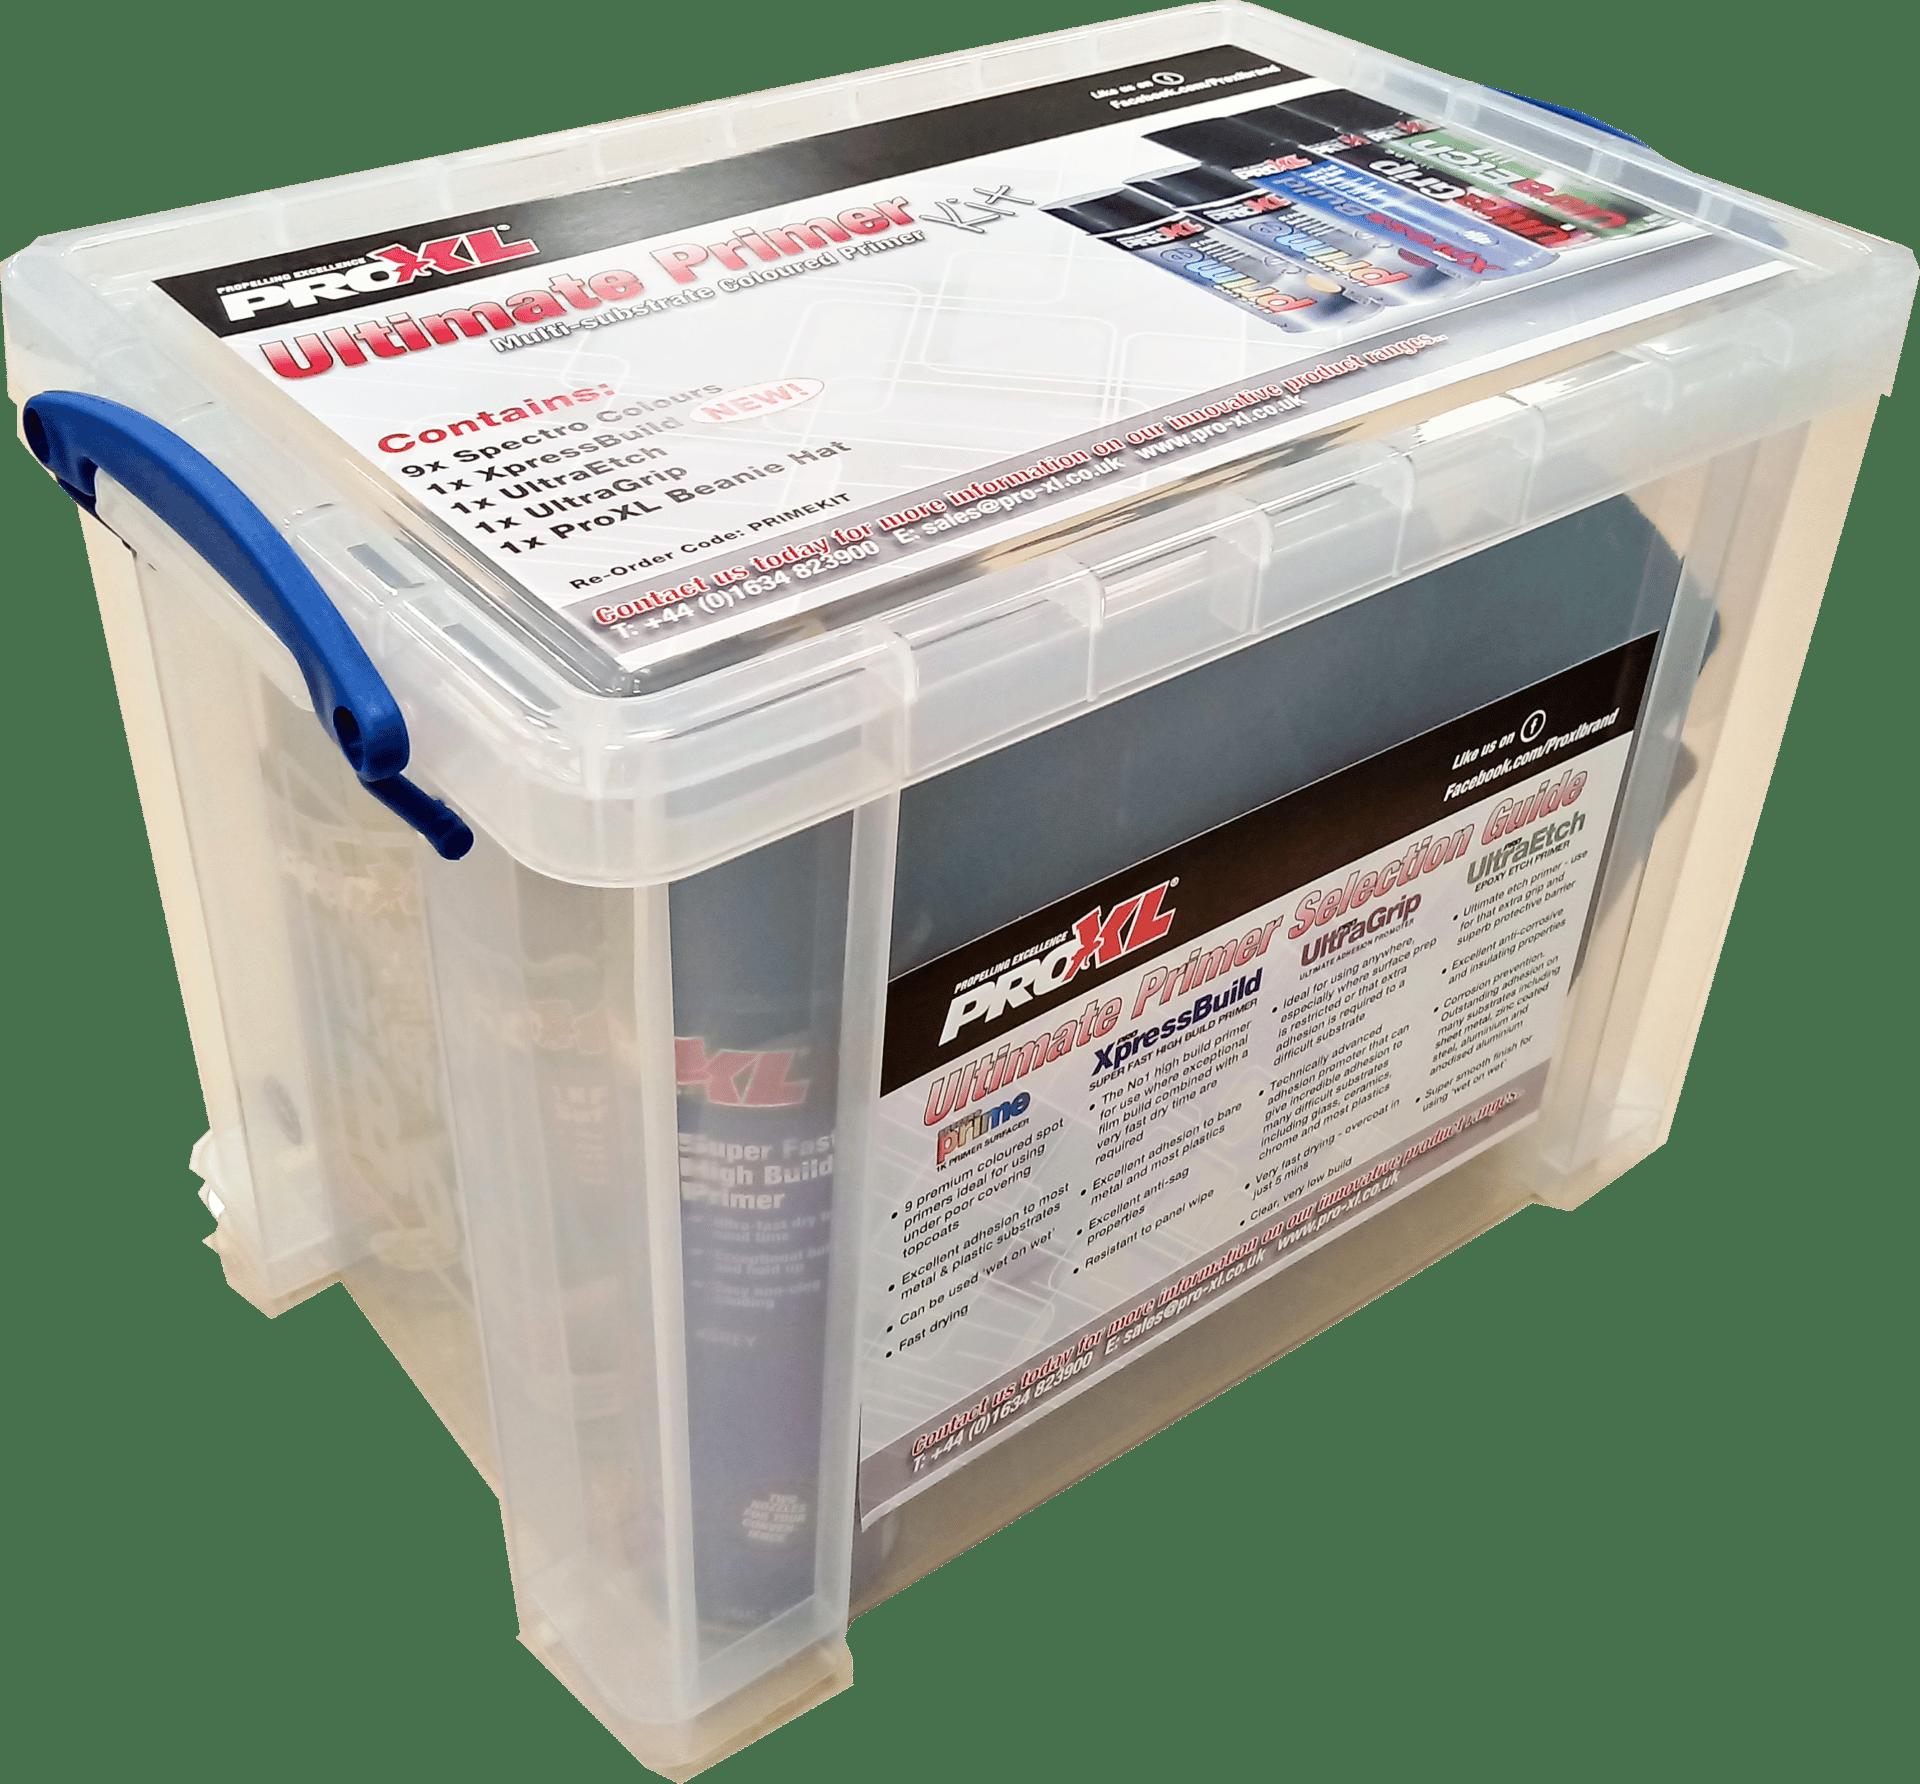 Ultimate Primer Aerosol Kit Product Image